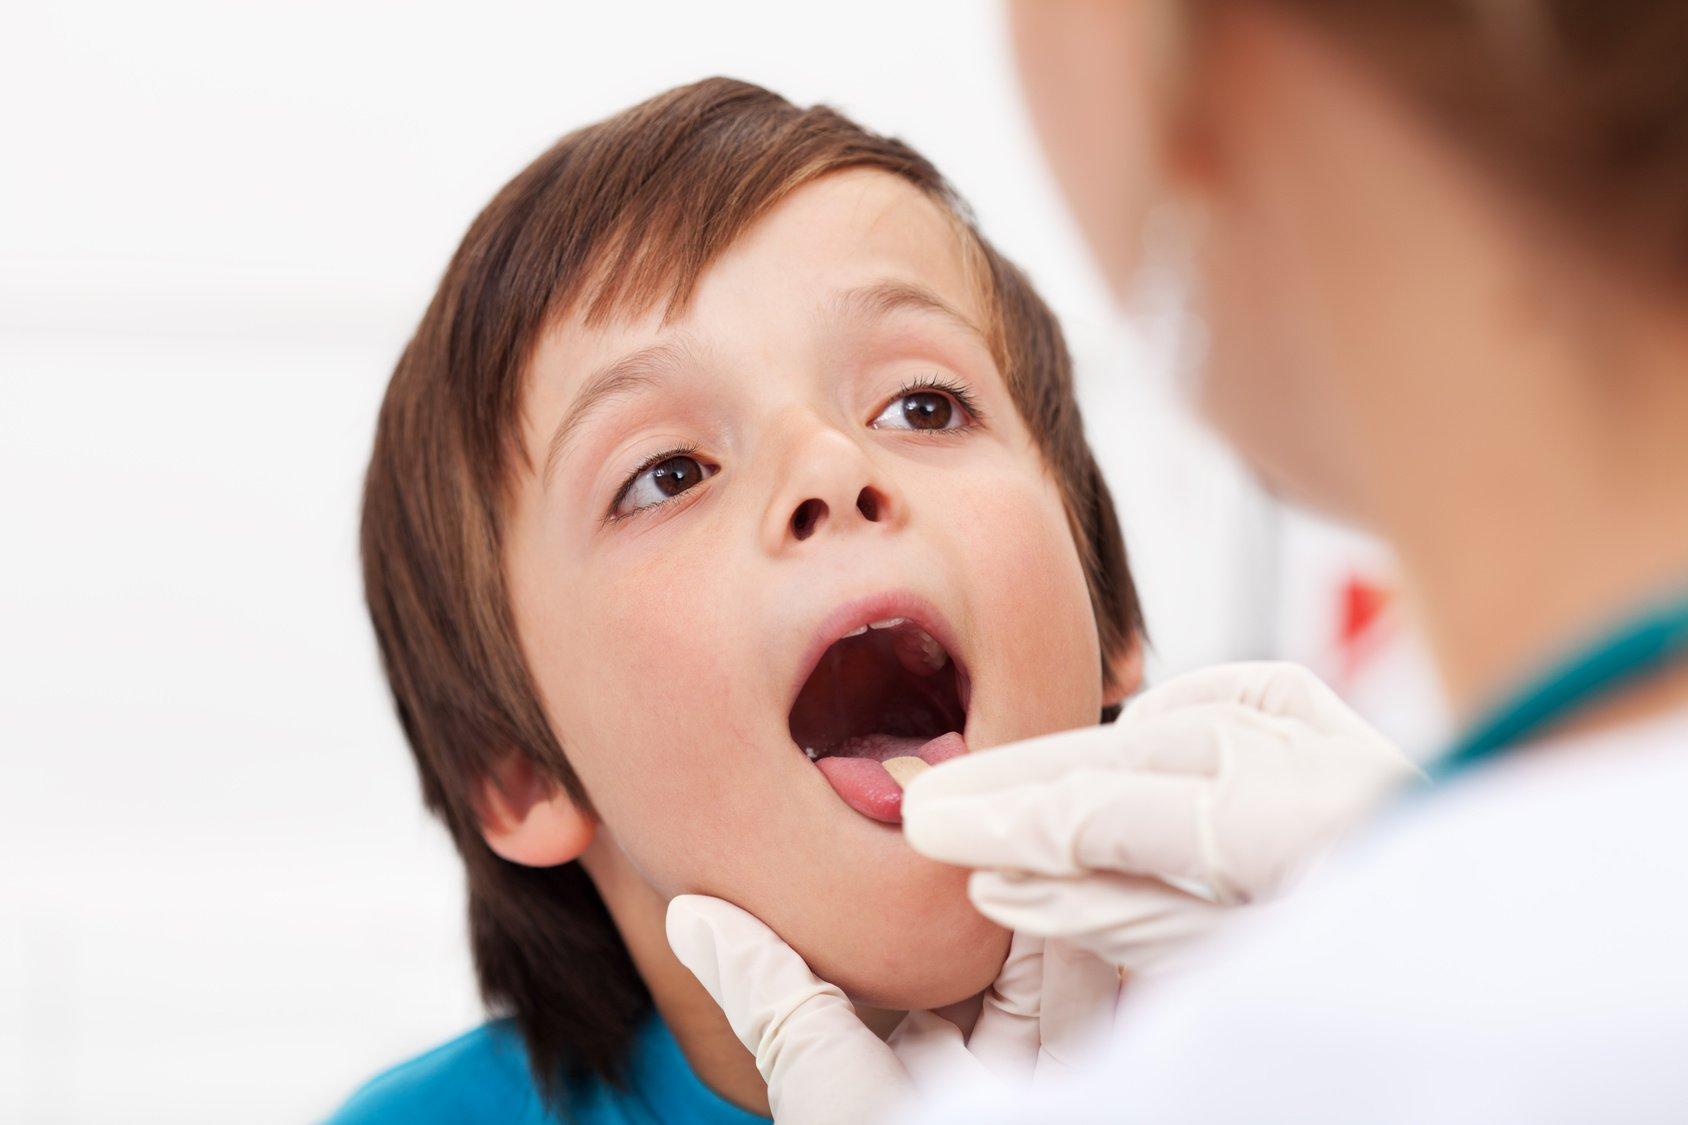 осмотр горла у ребёнка